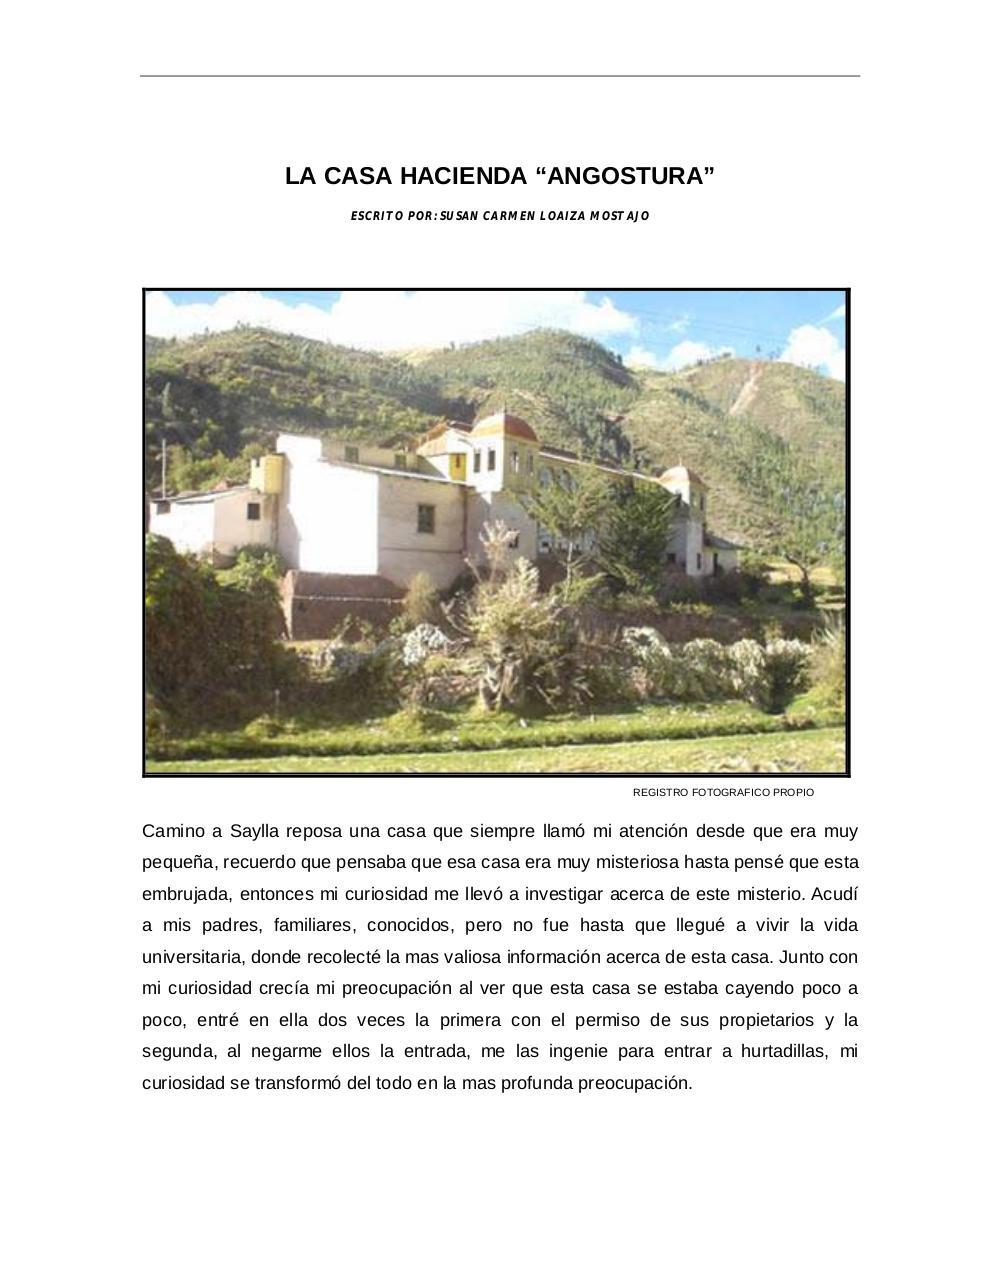 Los Garmendia De Cusco